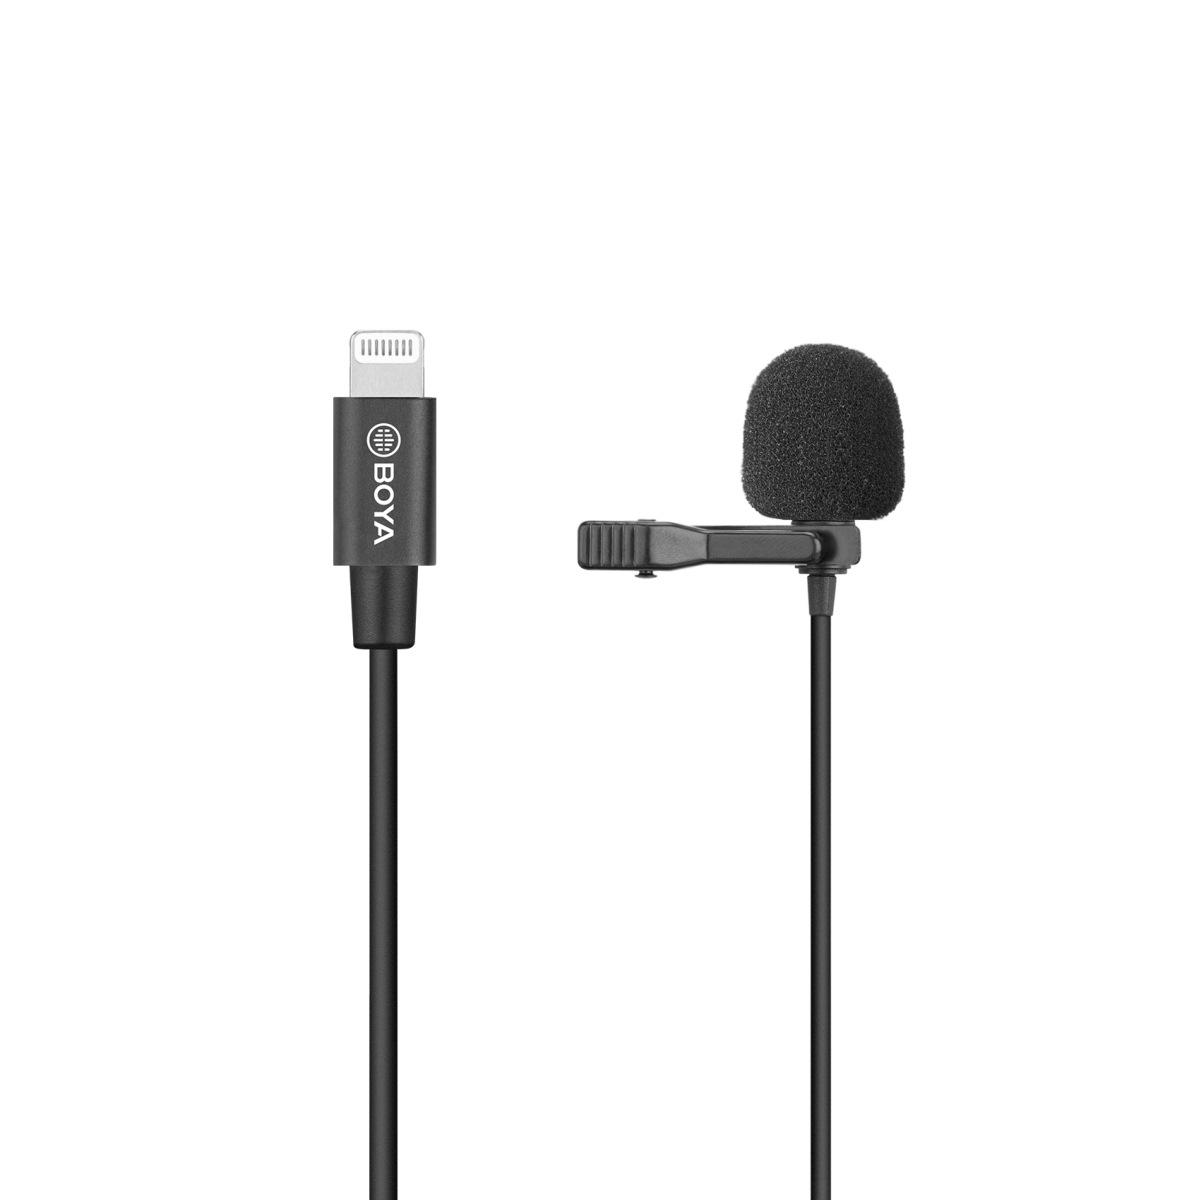 Walimex pro Boya M2 Lavalier Microphone for iOS